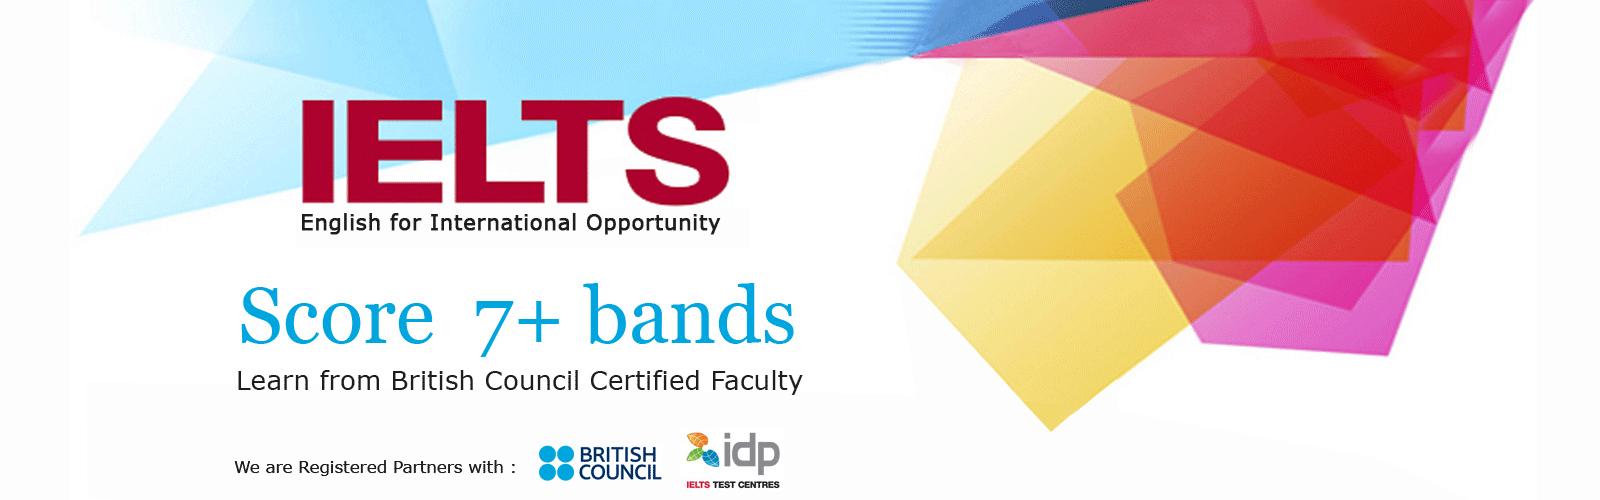 Study Abroad Consultants in Kerala | Best IELTS Centre In